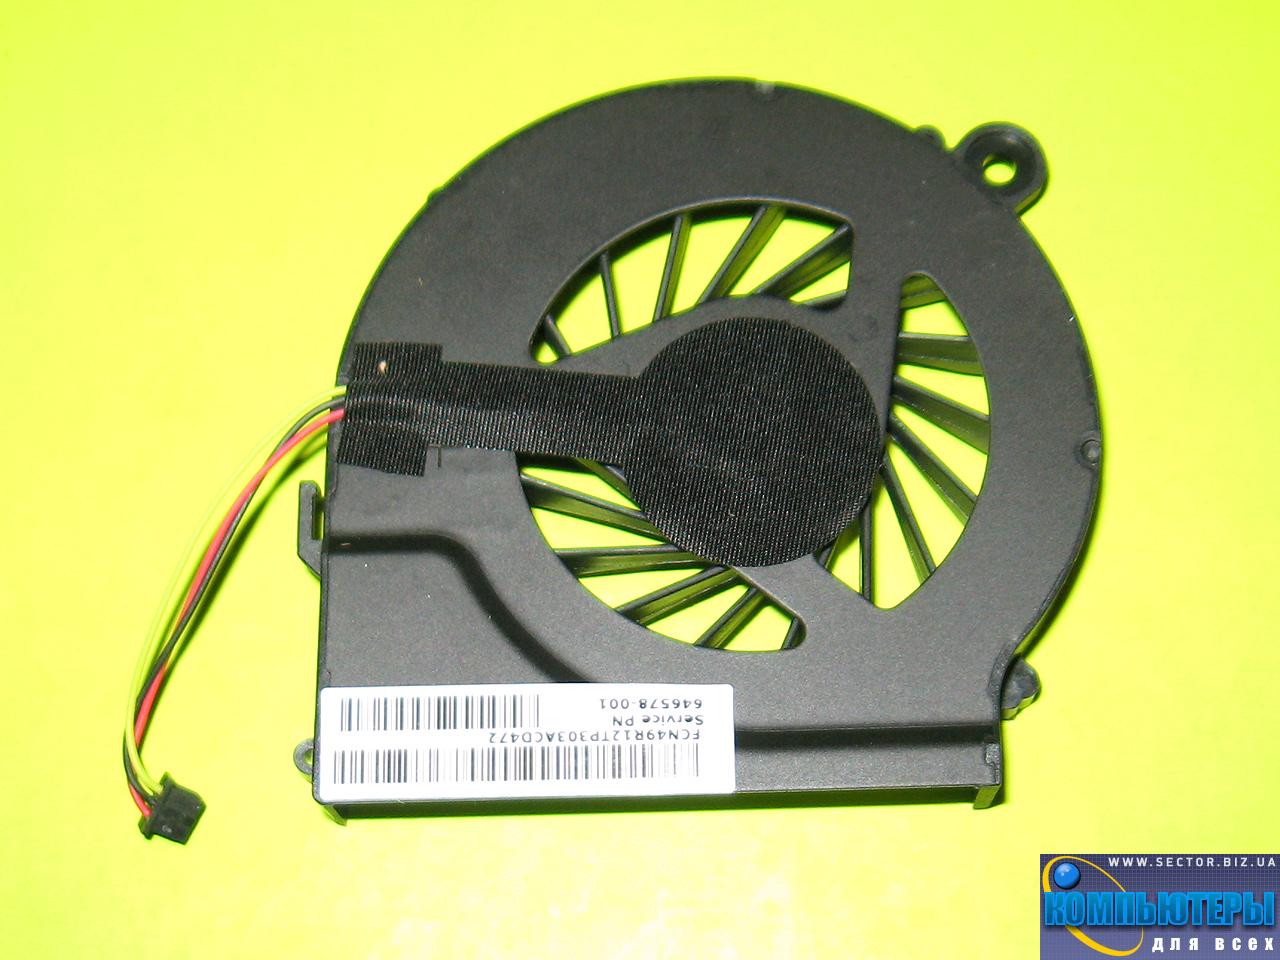 Кулер к ноутбуку HP Compaq CQ42 G42 G4 G6 G7 CQ56 G56 p/n: DFS531105MC0T FAB9. Фото № 4.